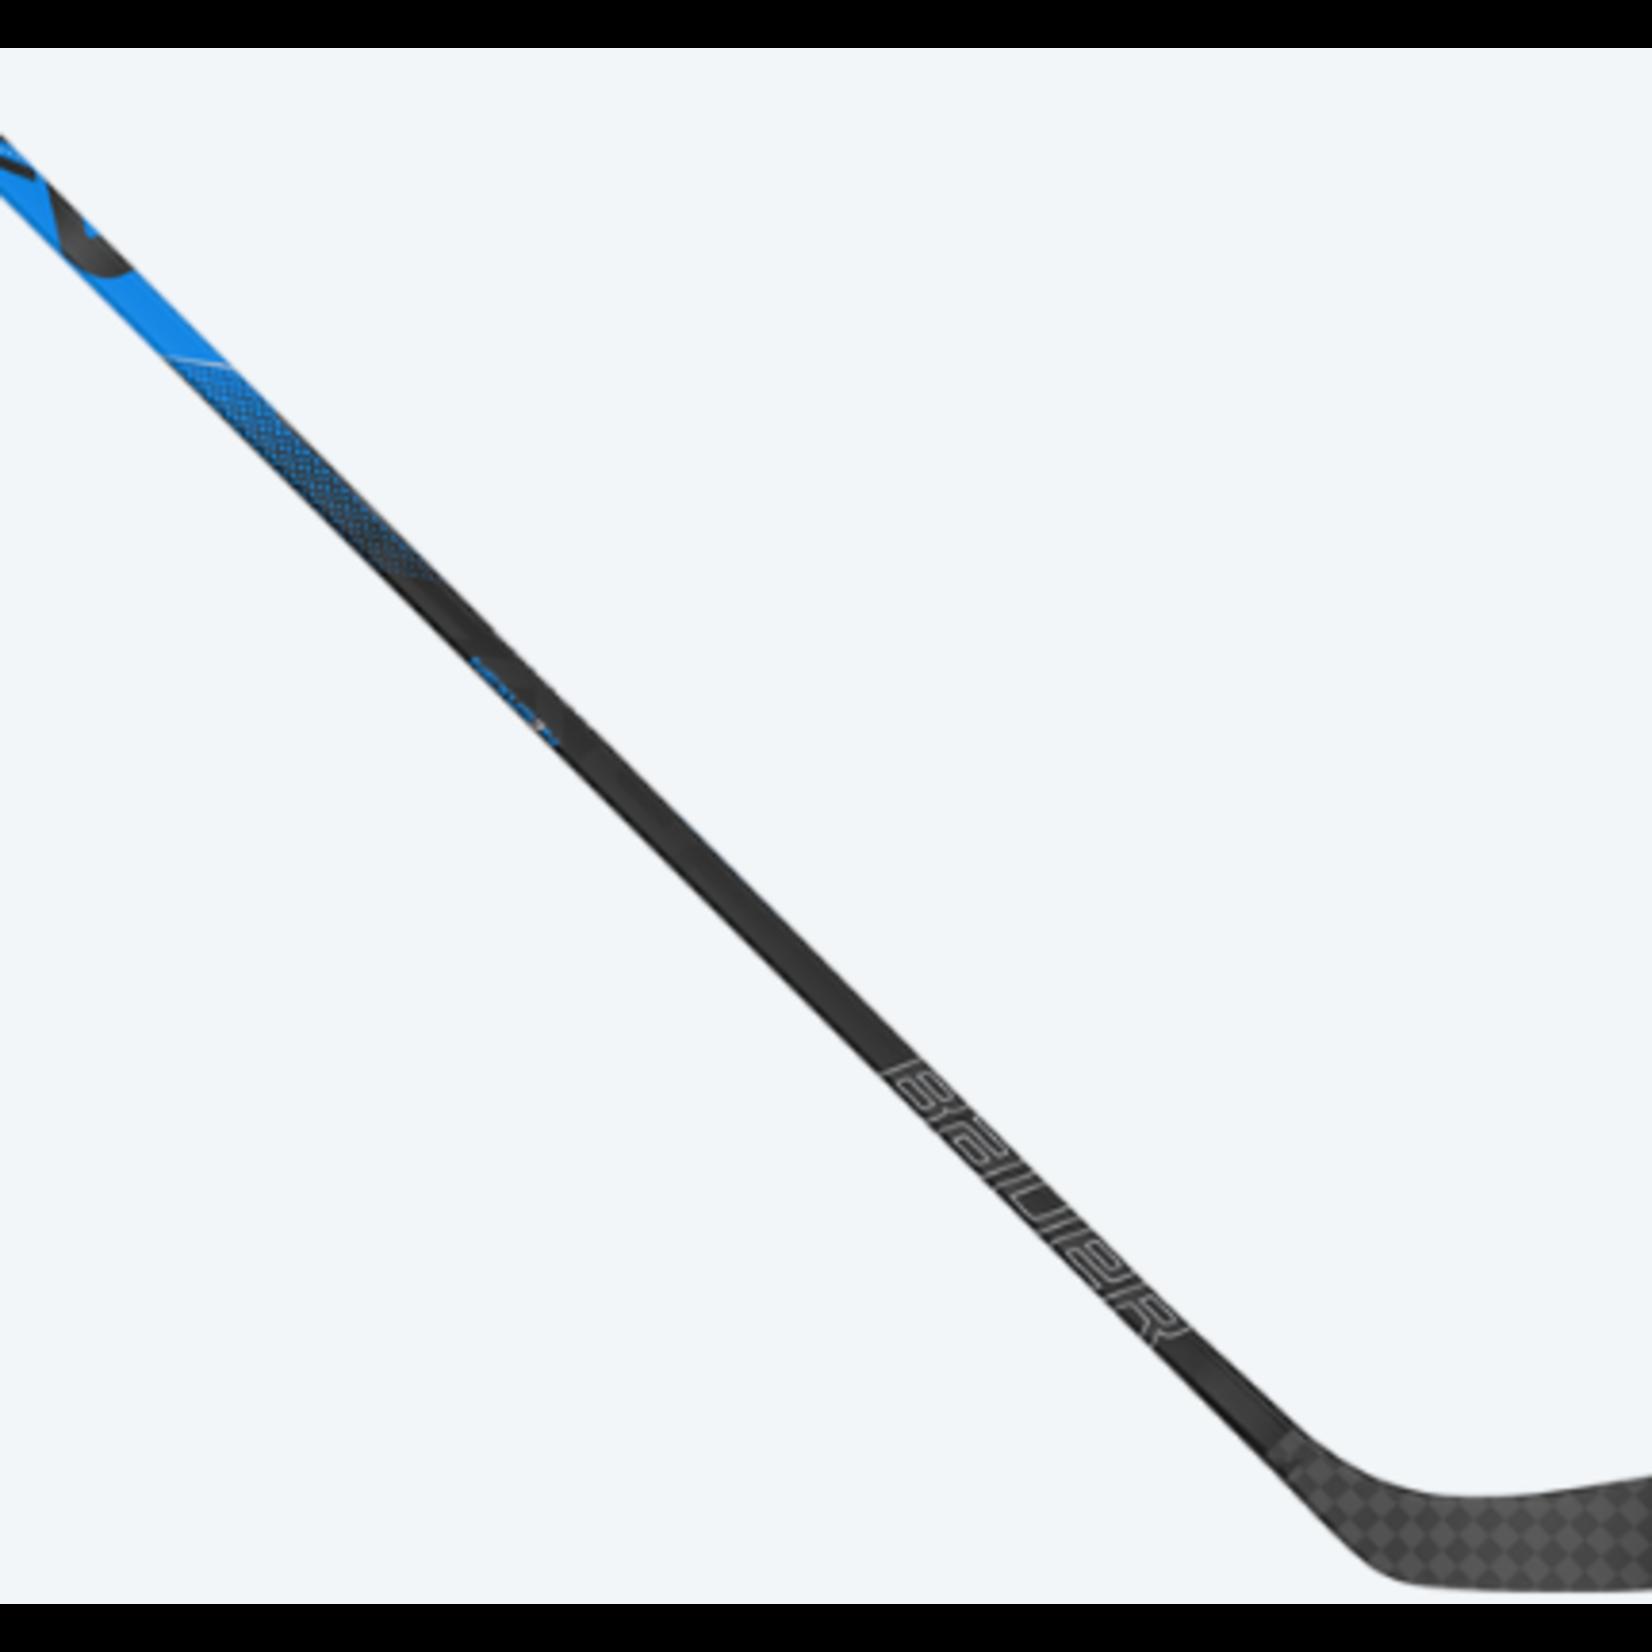 S21 Nexus 3N Grip Stick Sr - 70